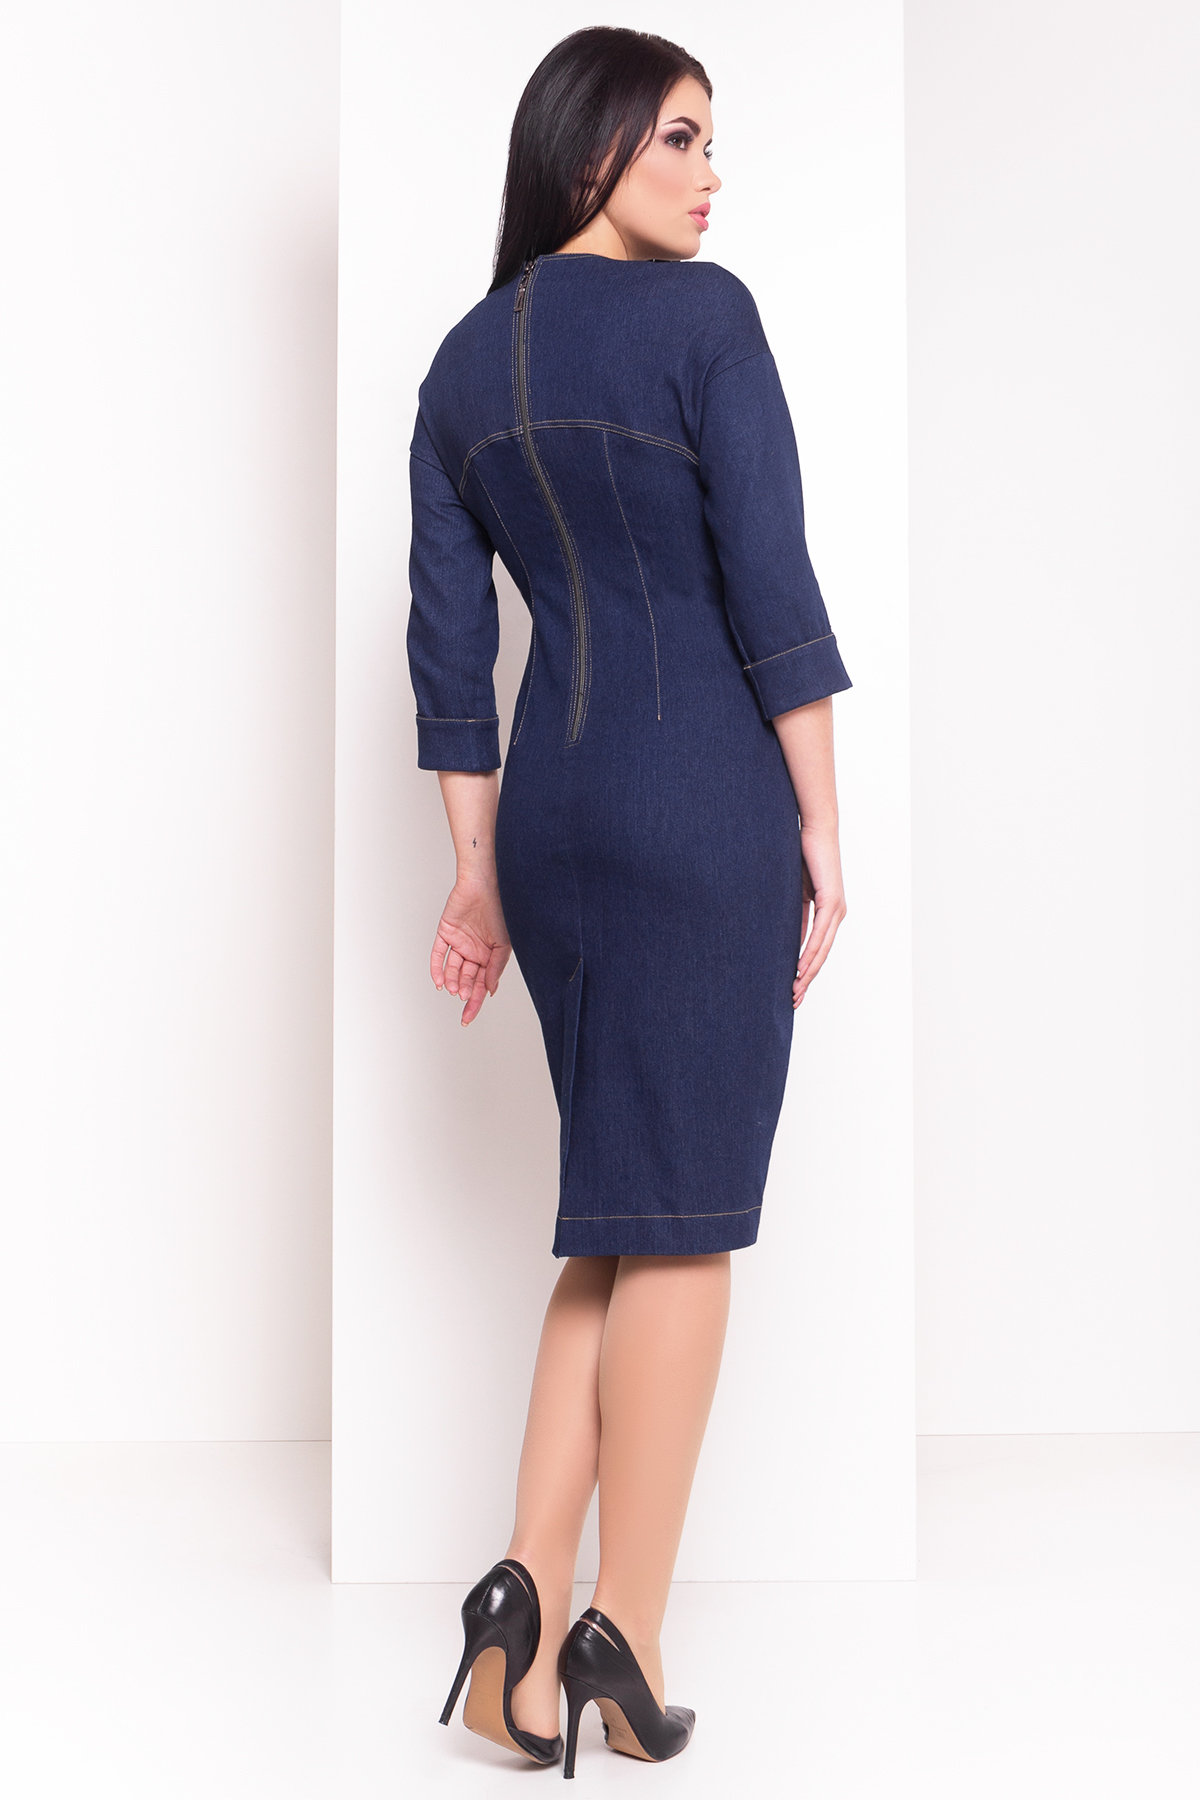 Платье Марио 3650 Цвет: Темно-синий